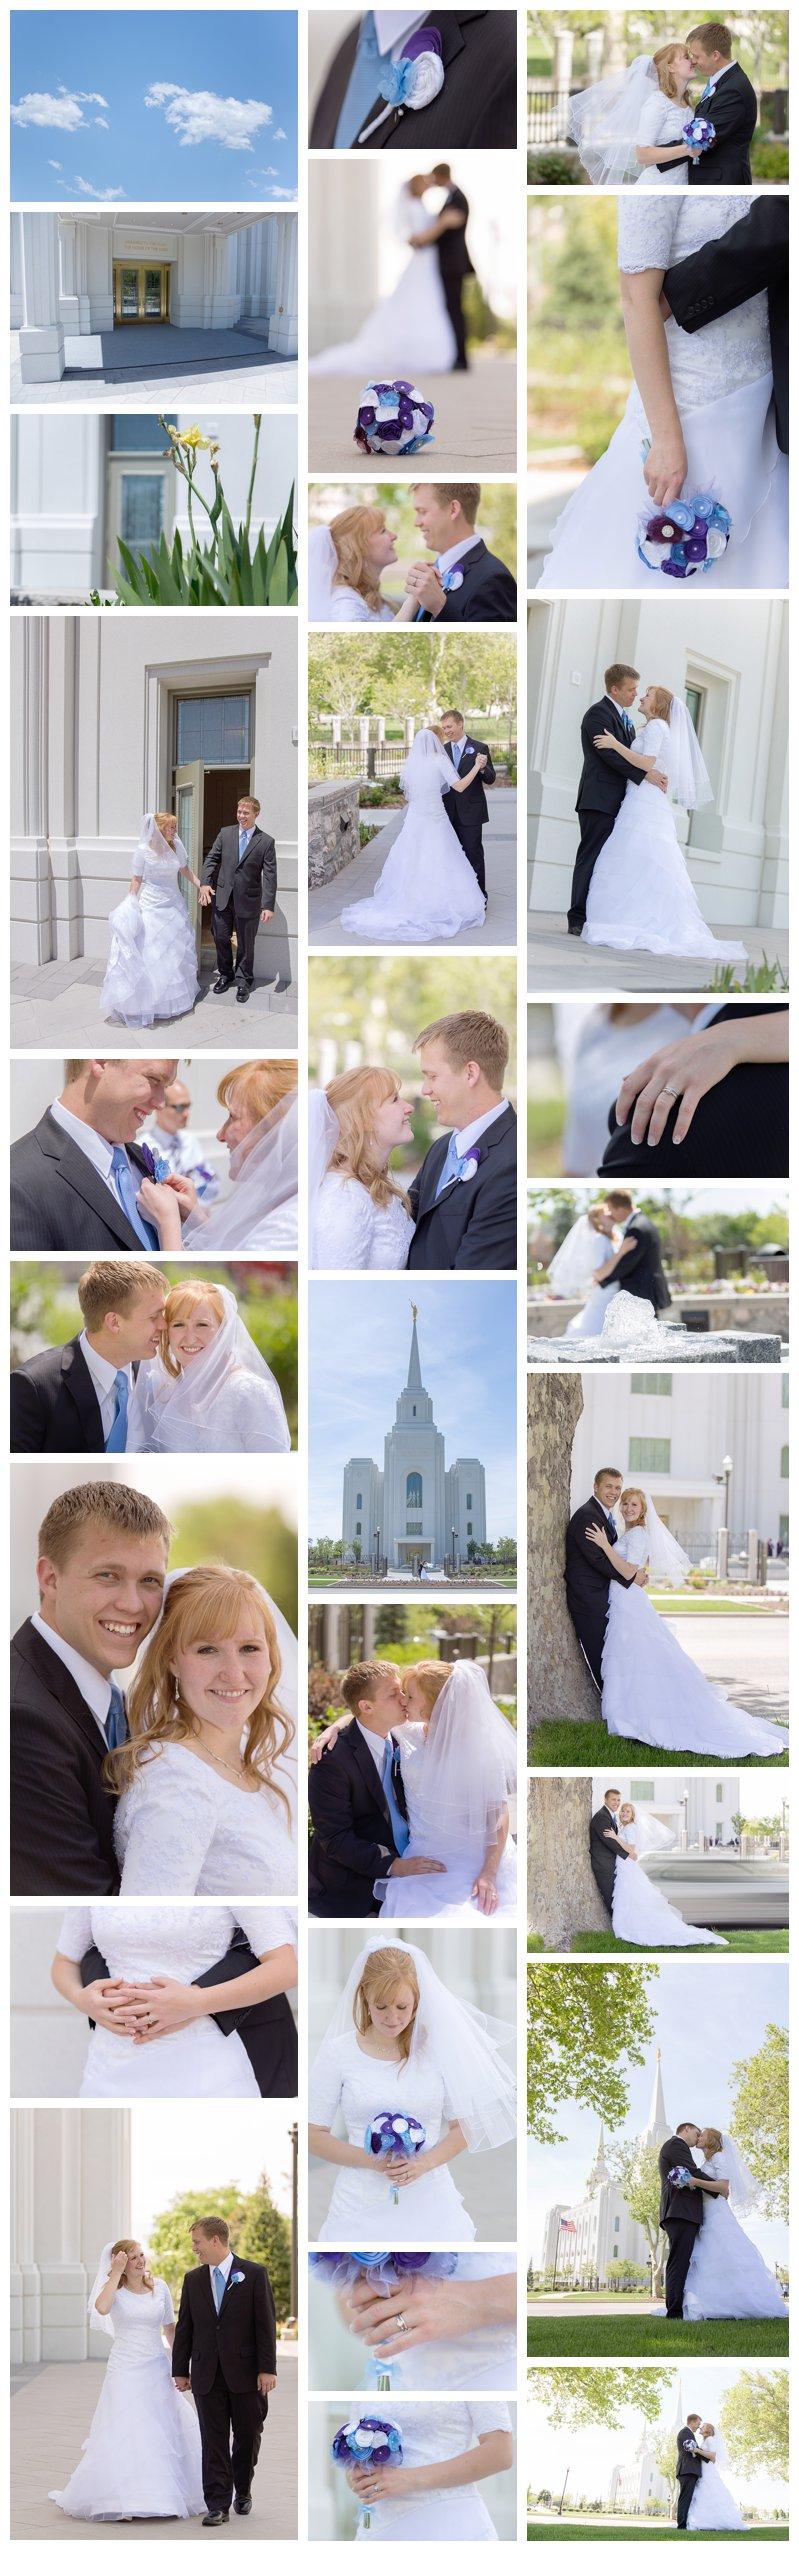 Brigham City temple wedding